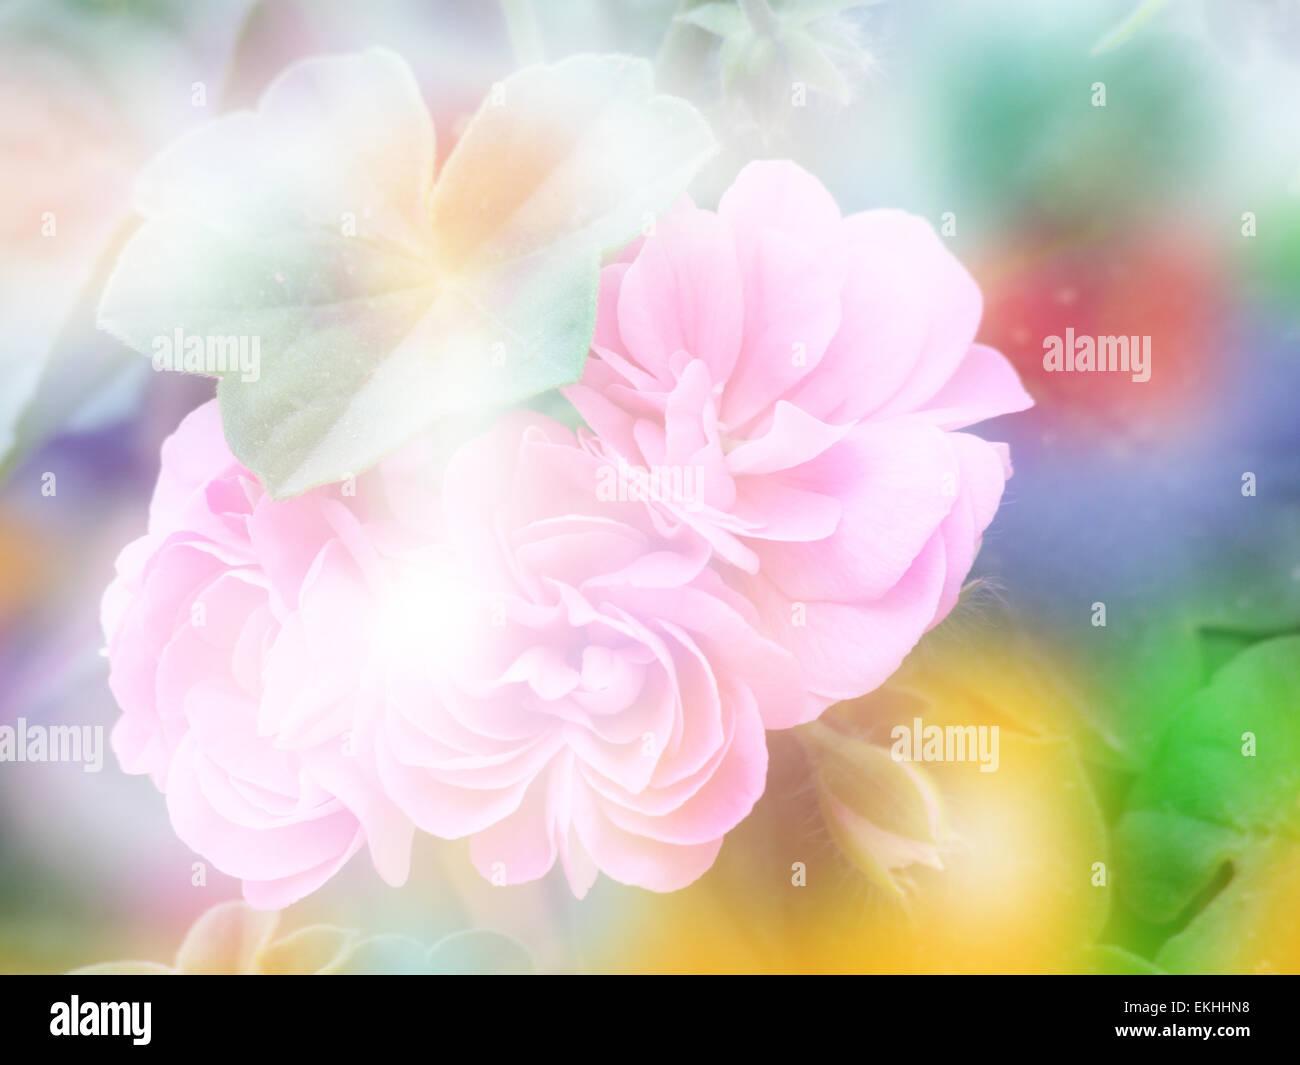 Double Exposure Geranium Flower With Bokeh Background Stock Photo